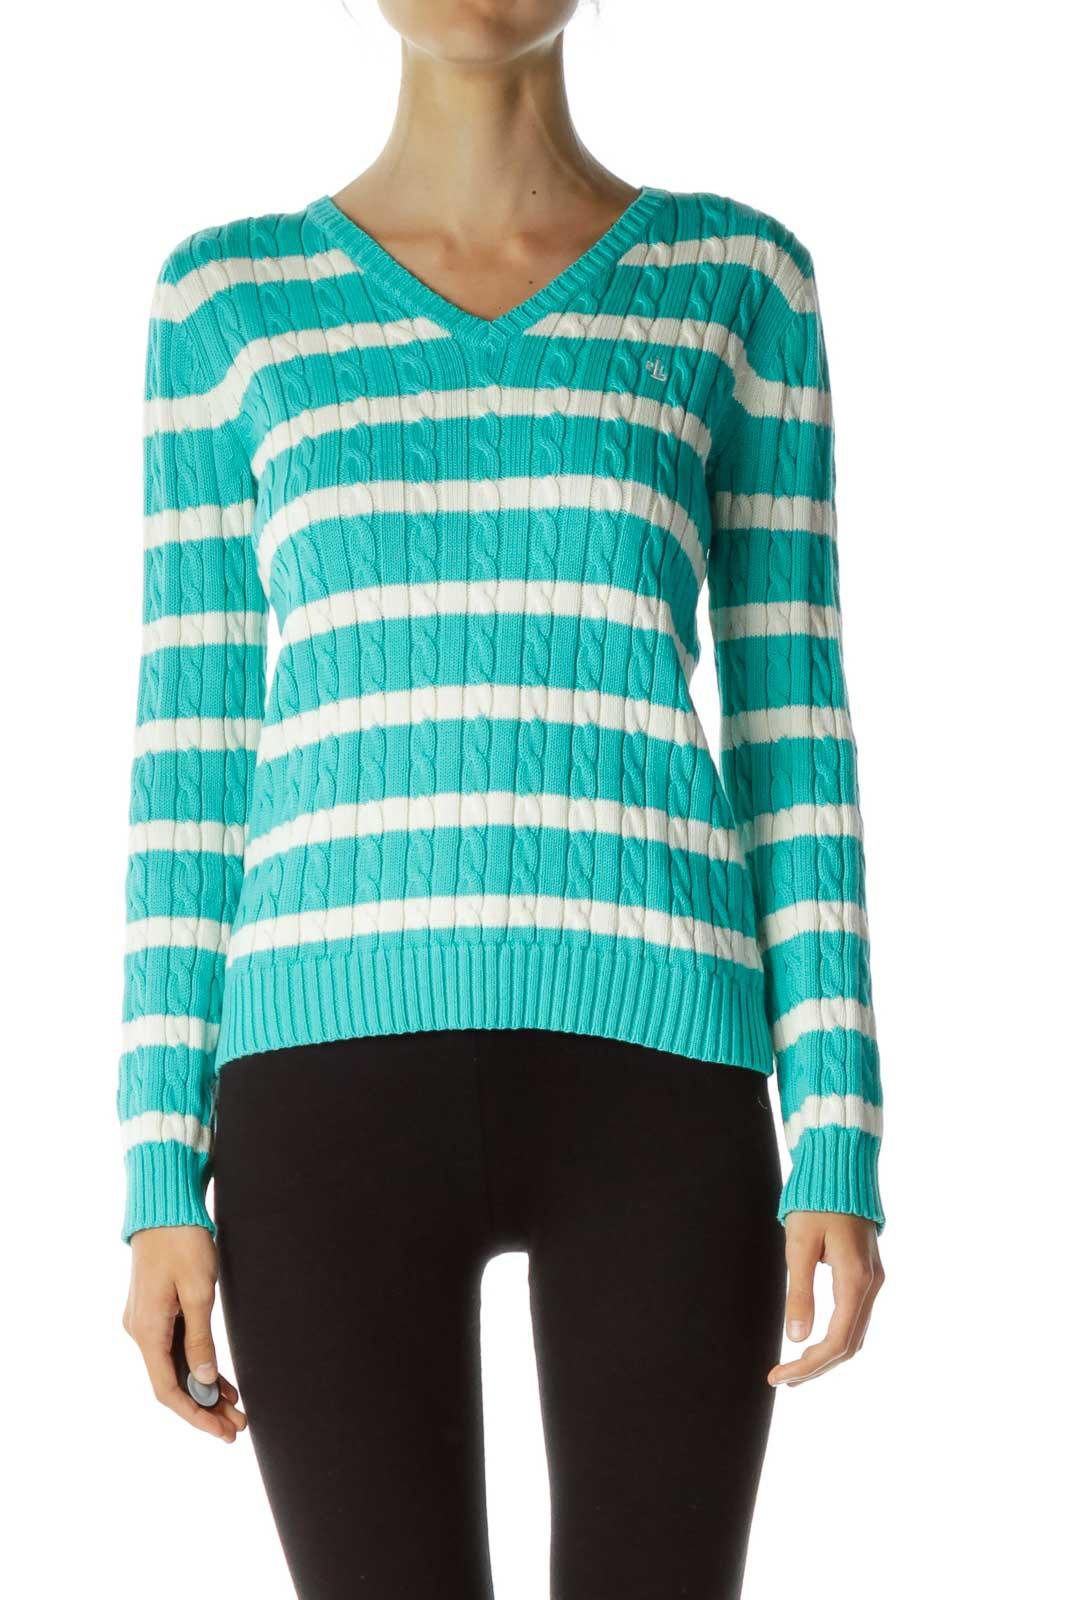 Blue White Striped V-Neck Sweater Front